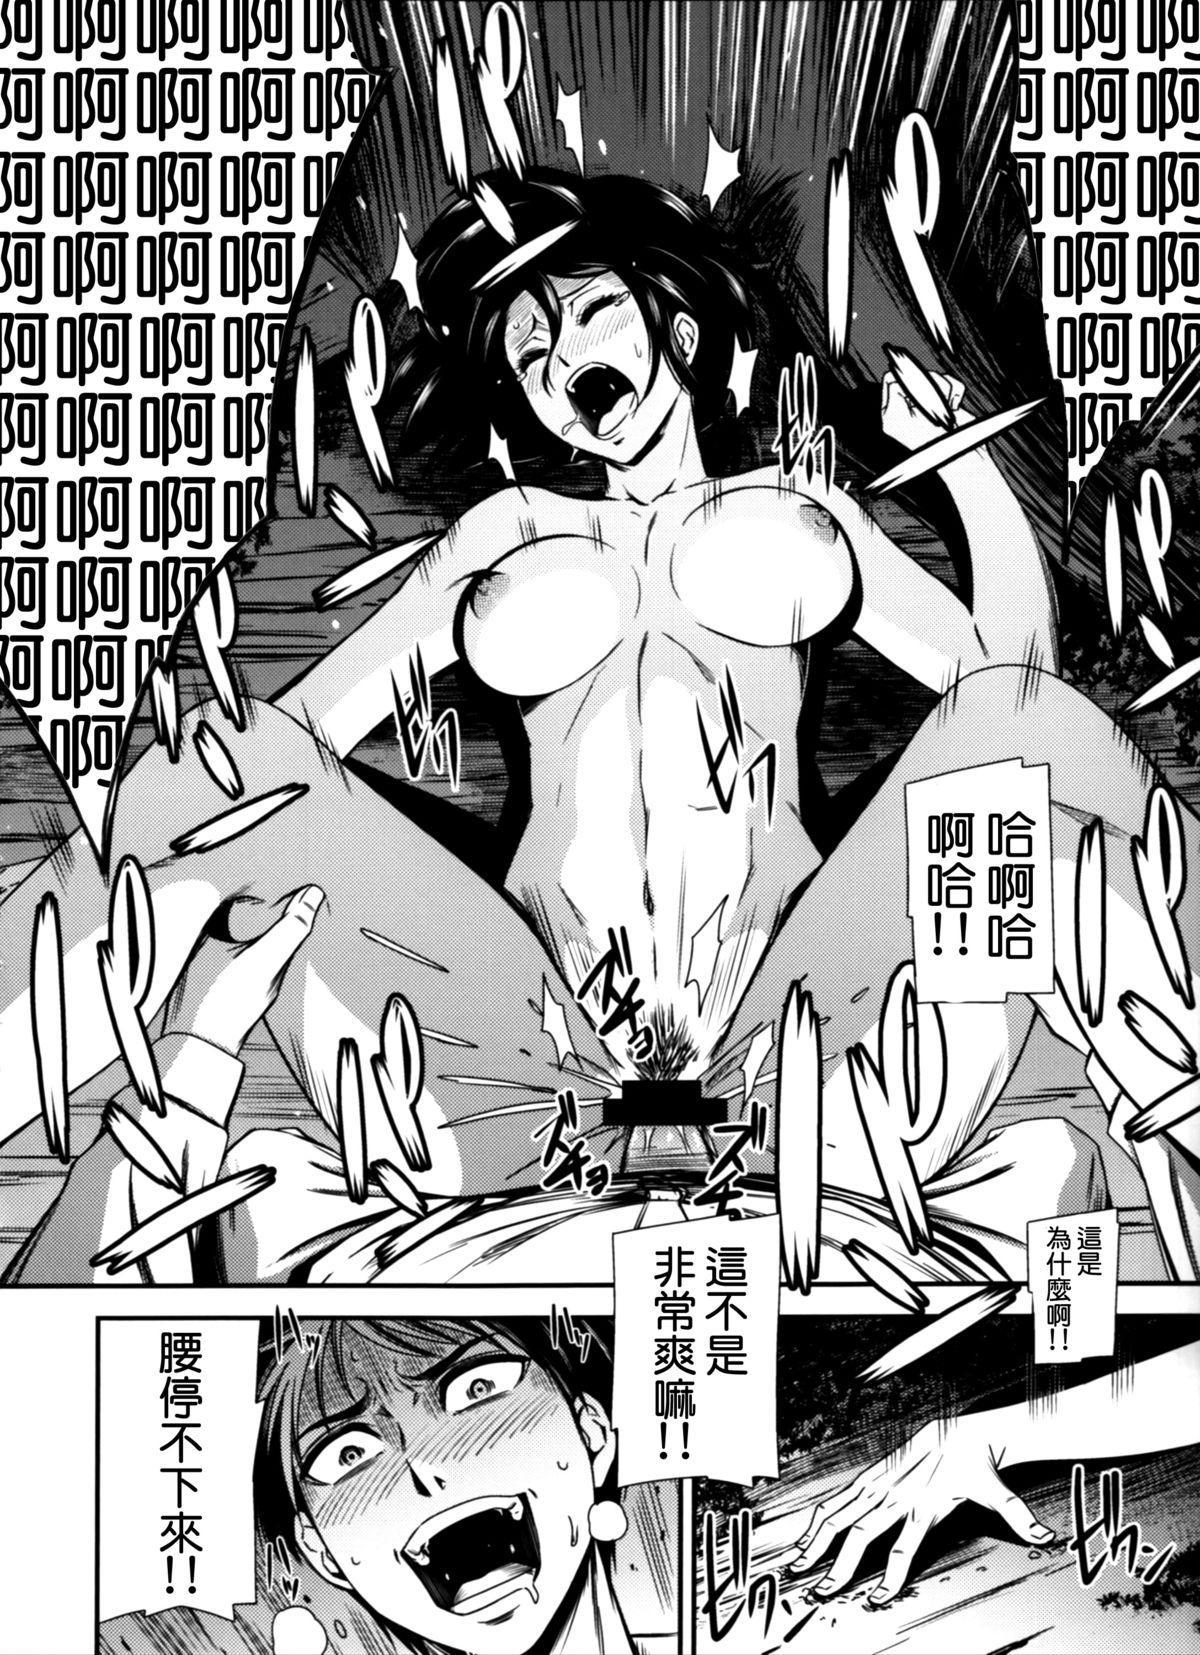 Gekishin Yon 30